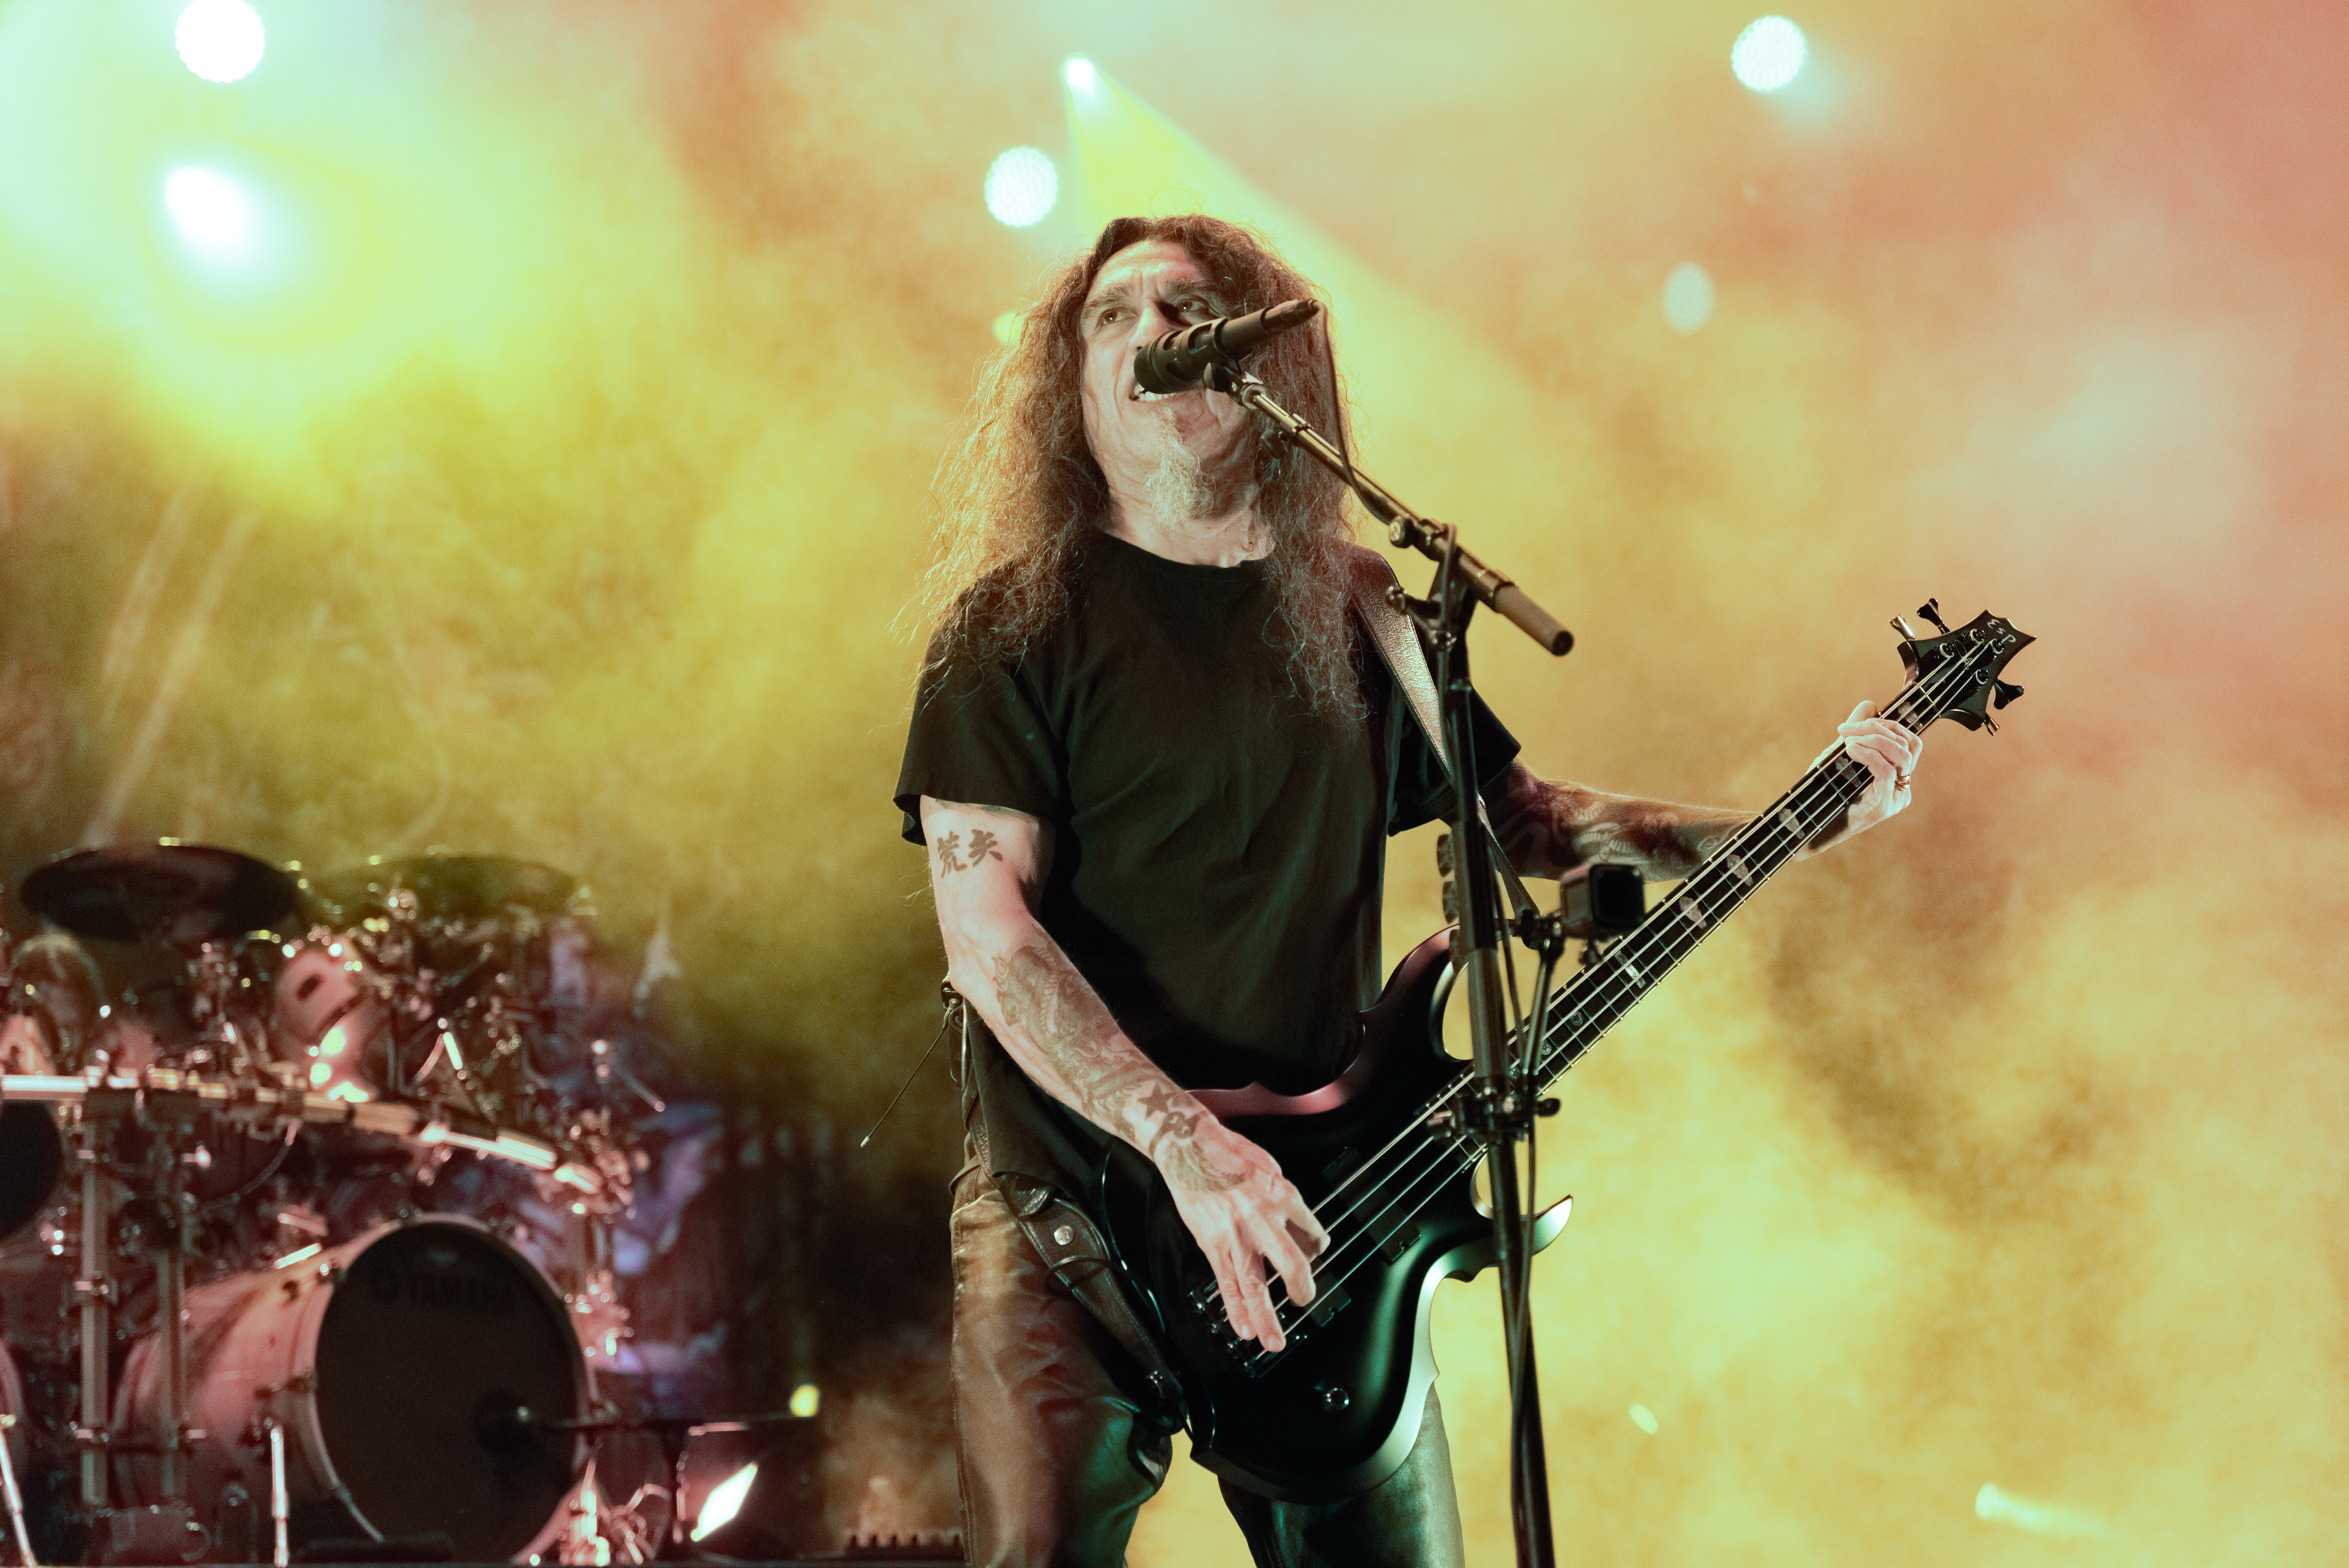 Slayer rocks harder than ever on their final world tour